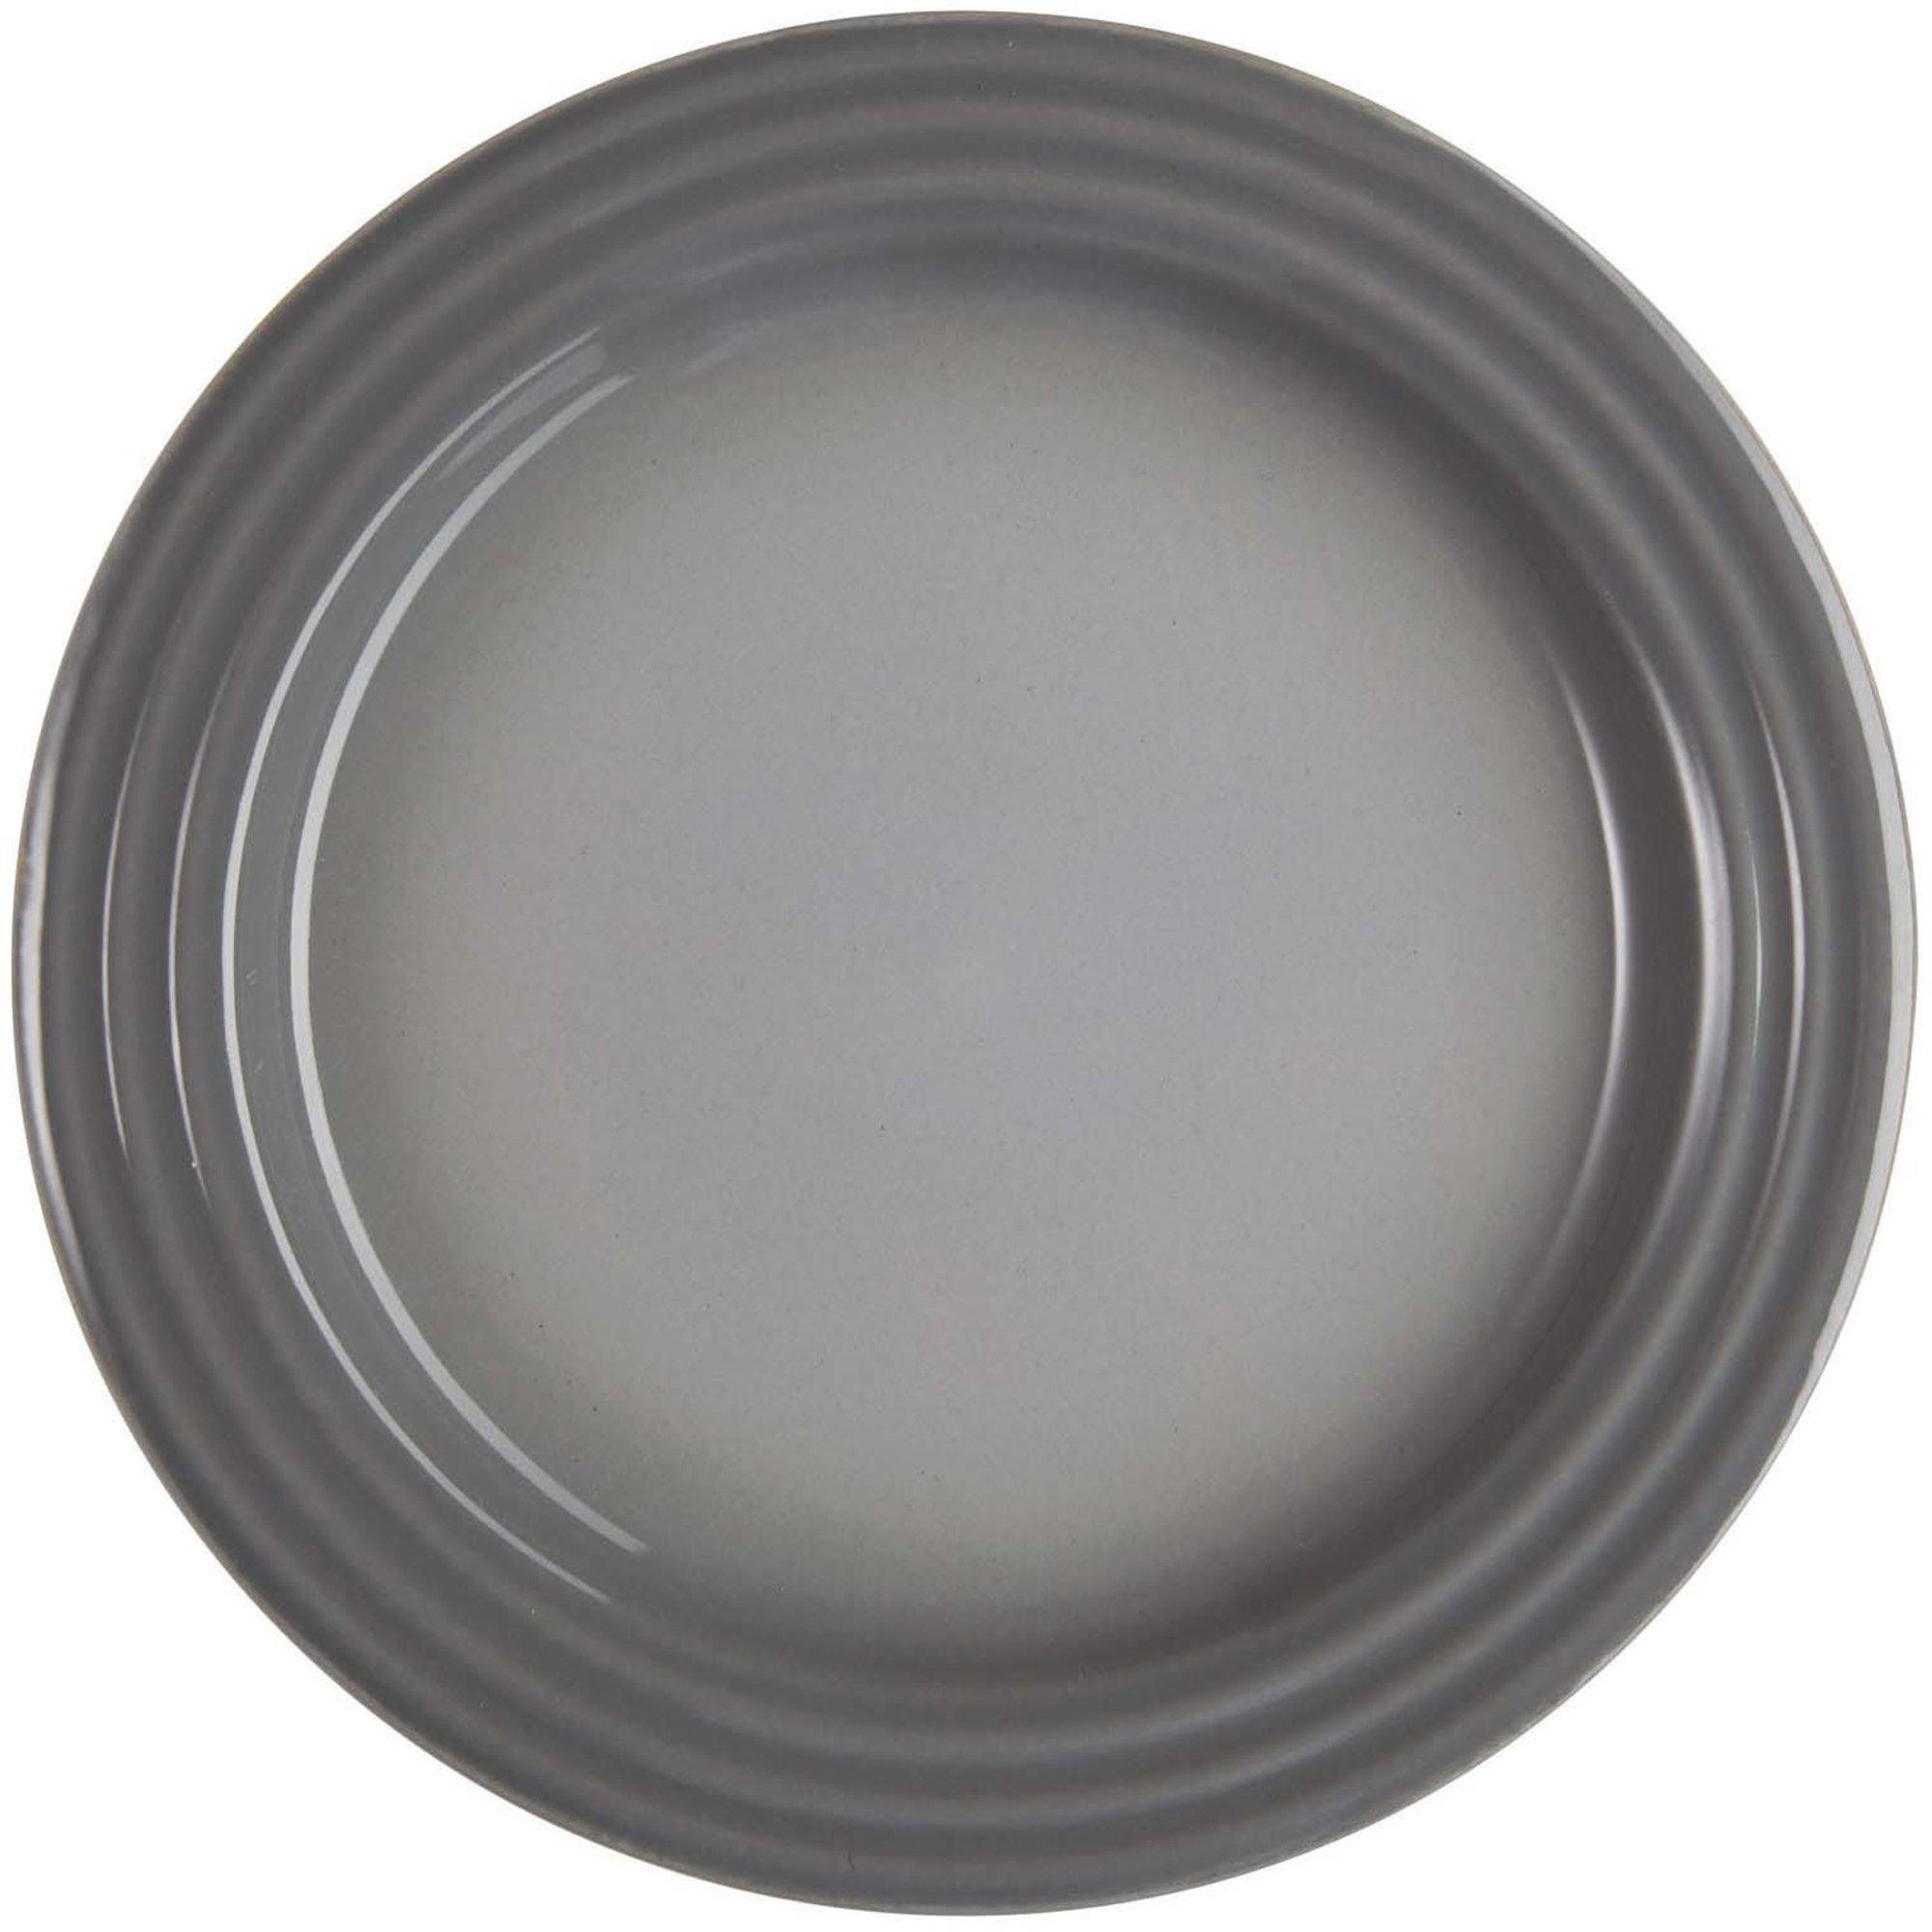 Le Creuset Signature Tallrik 22cm Mist Gray